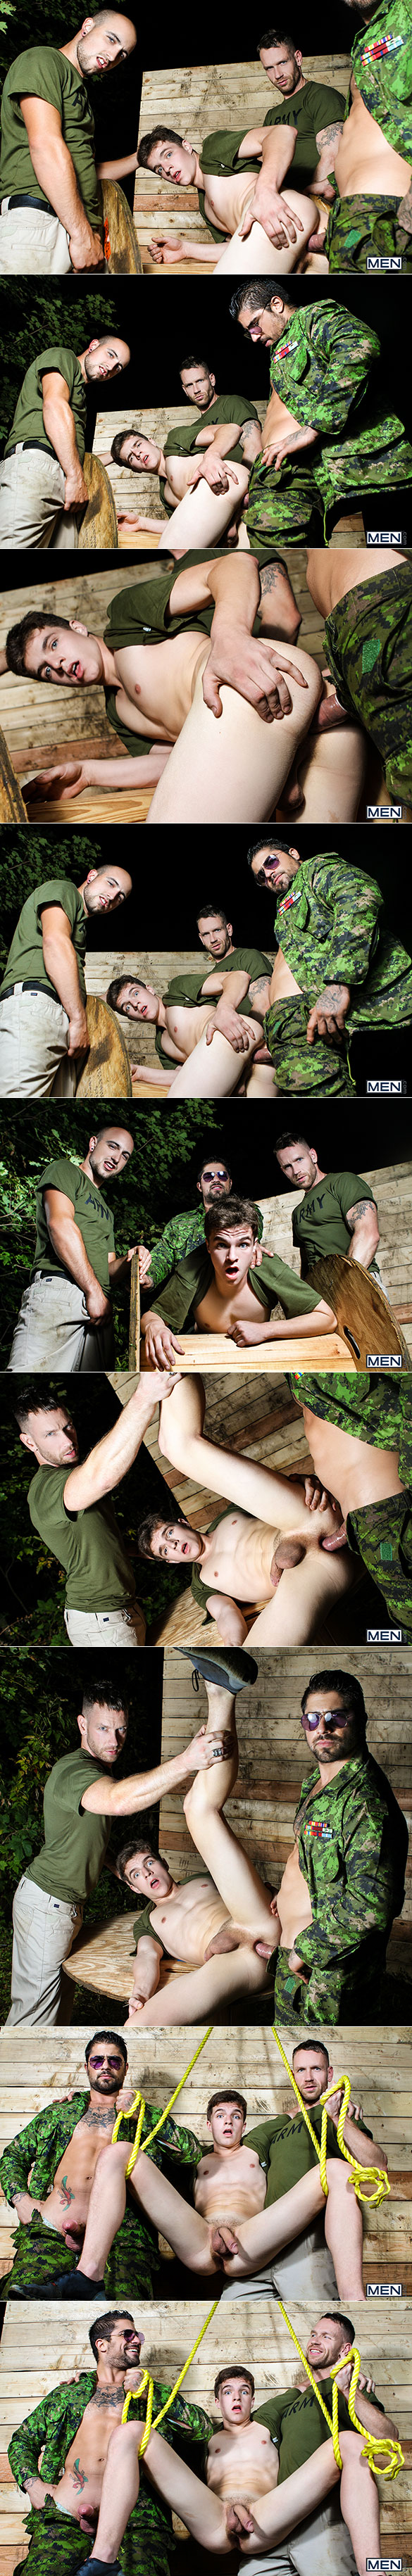 "Men.com: Ryan Bones fucks Bellamy Bradley in ""Battle Buddies, Part 1"""